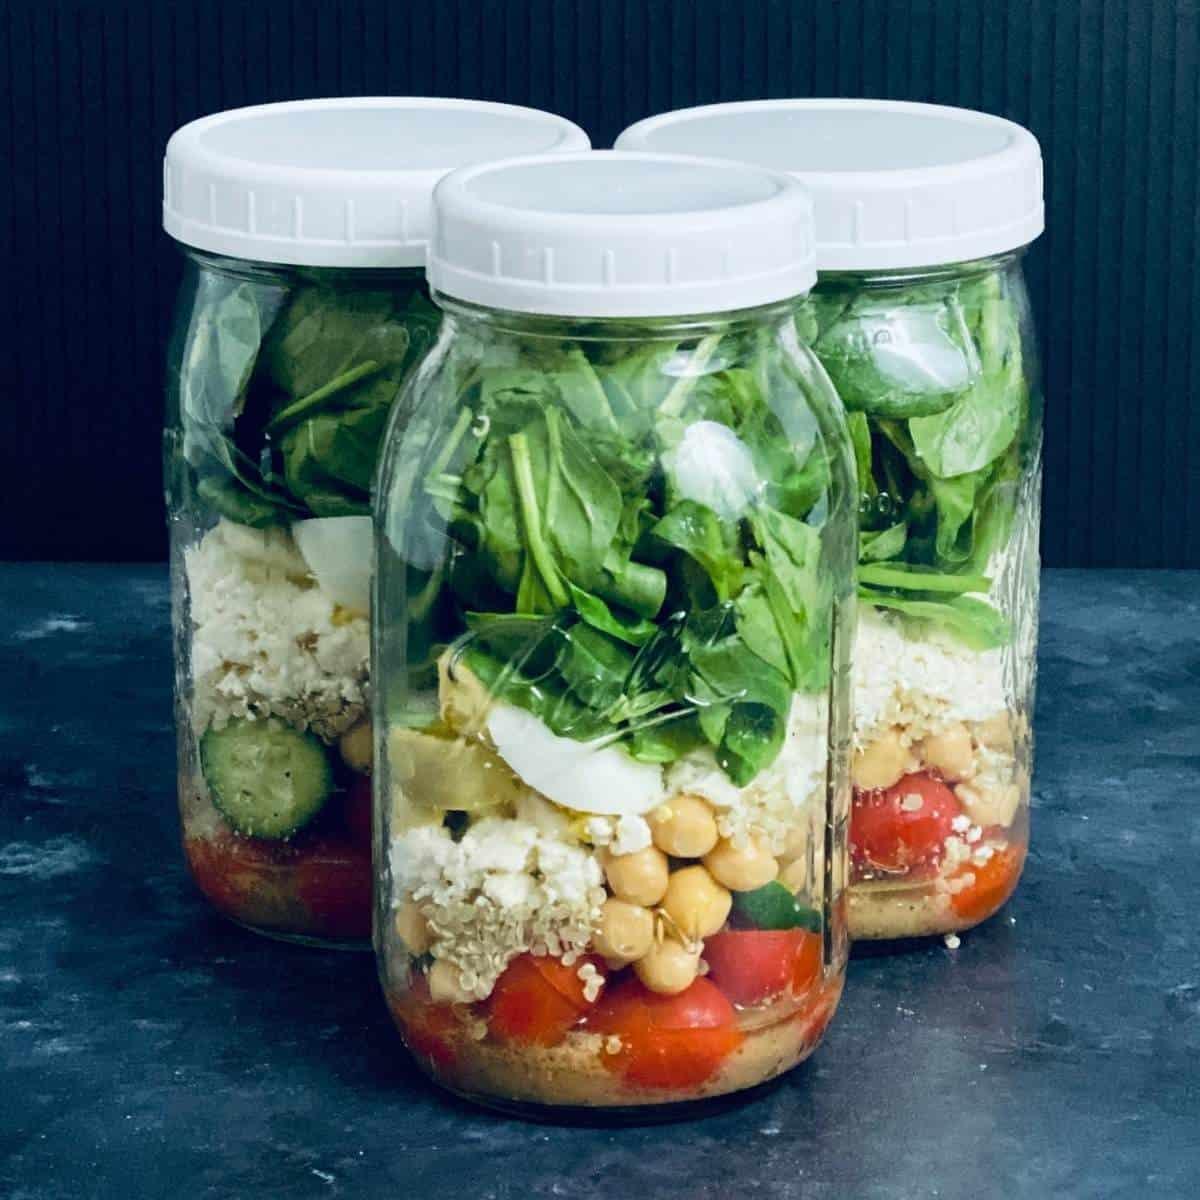 mason jar salad to meal prep for weight loss